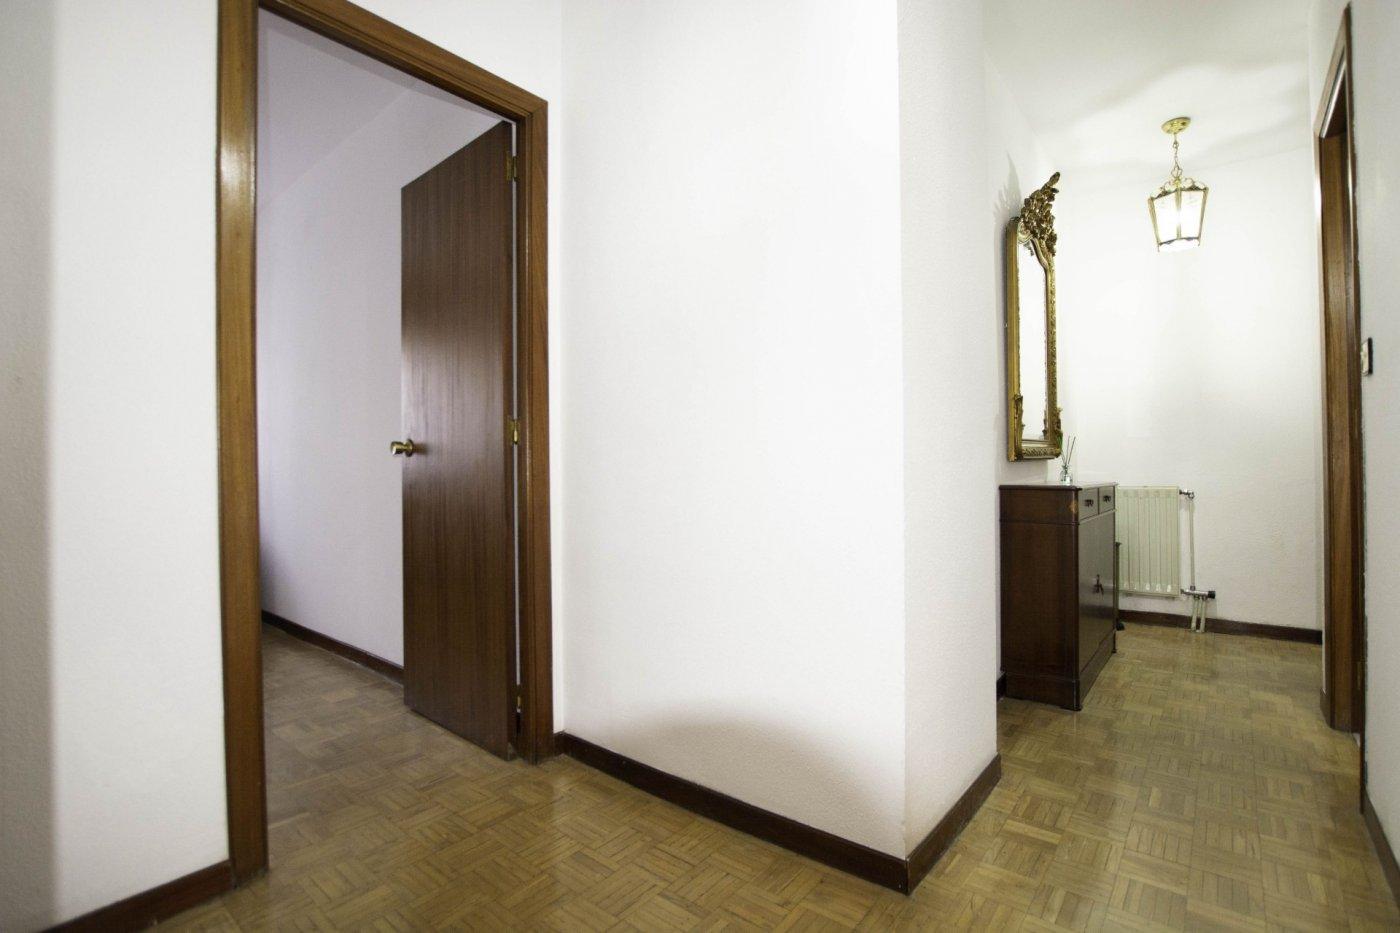 Apartamento en vallobin - imagenInmueble10